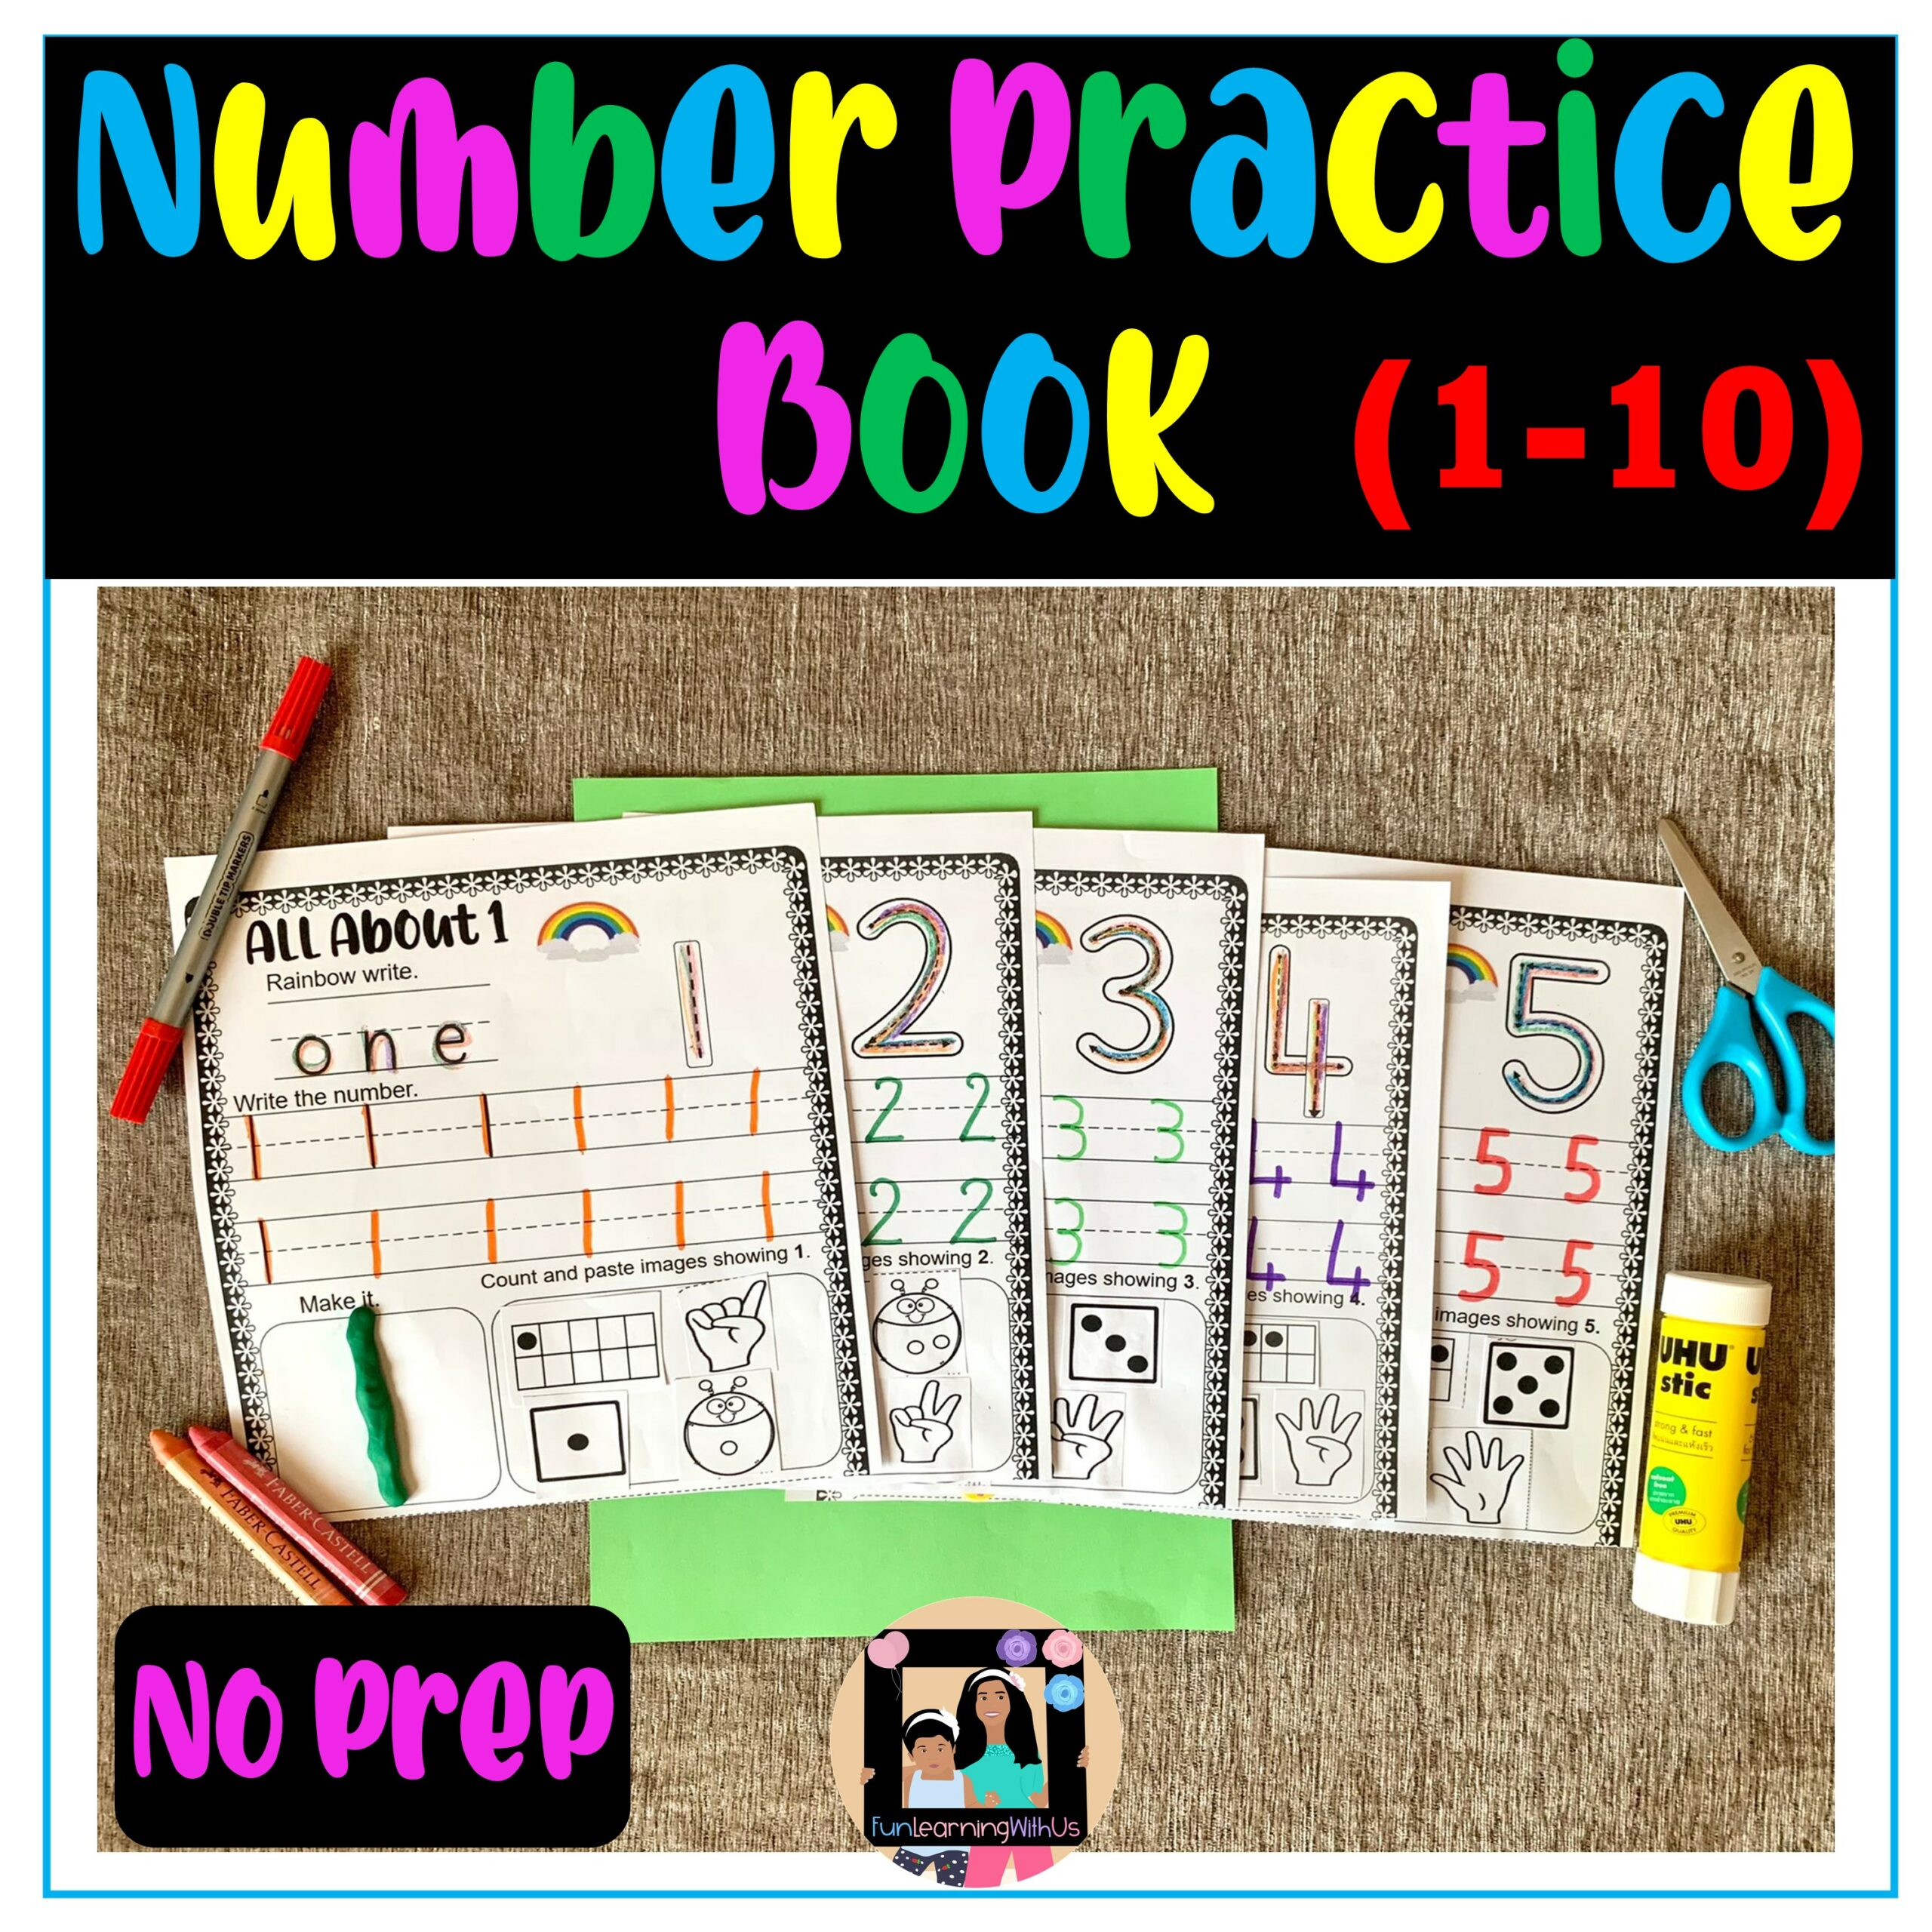 My Number Practice Book (1-10)